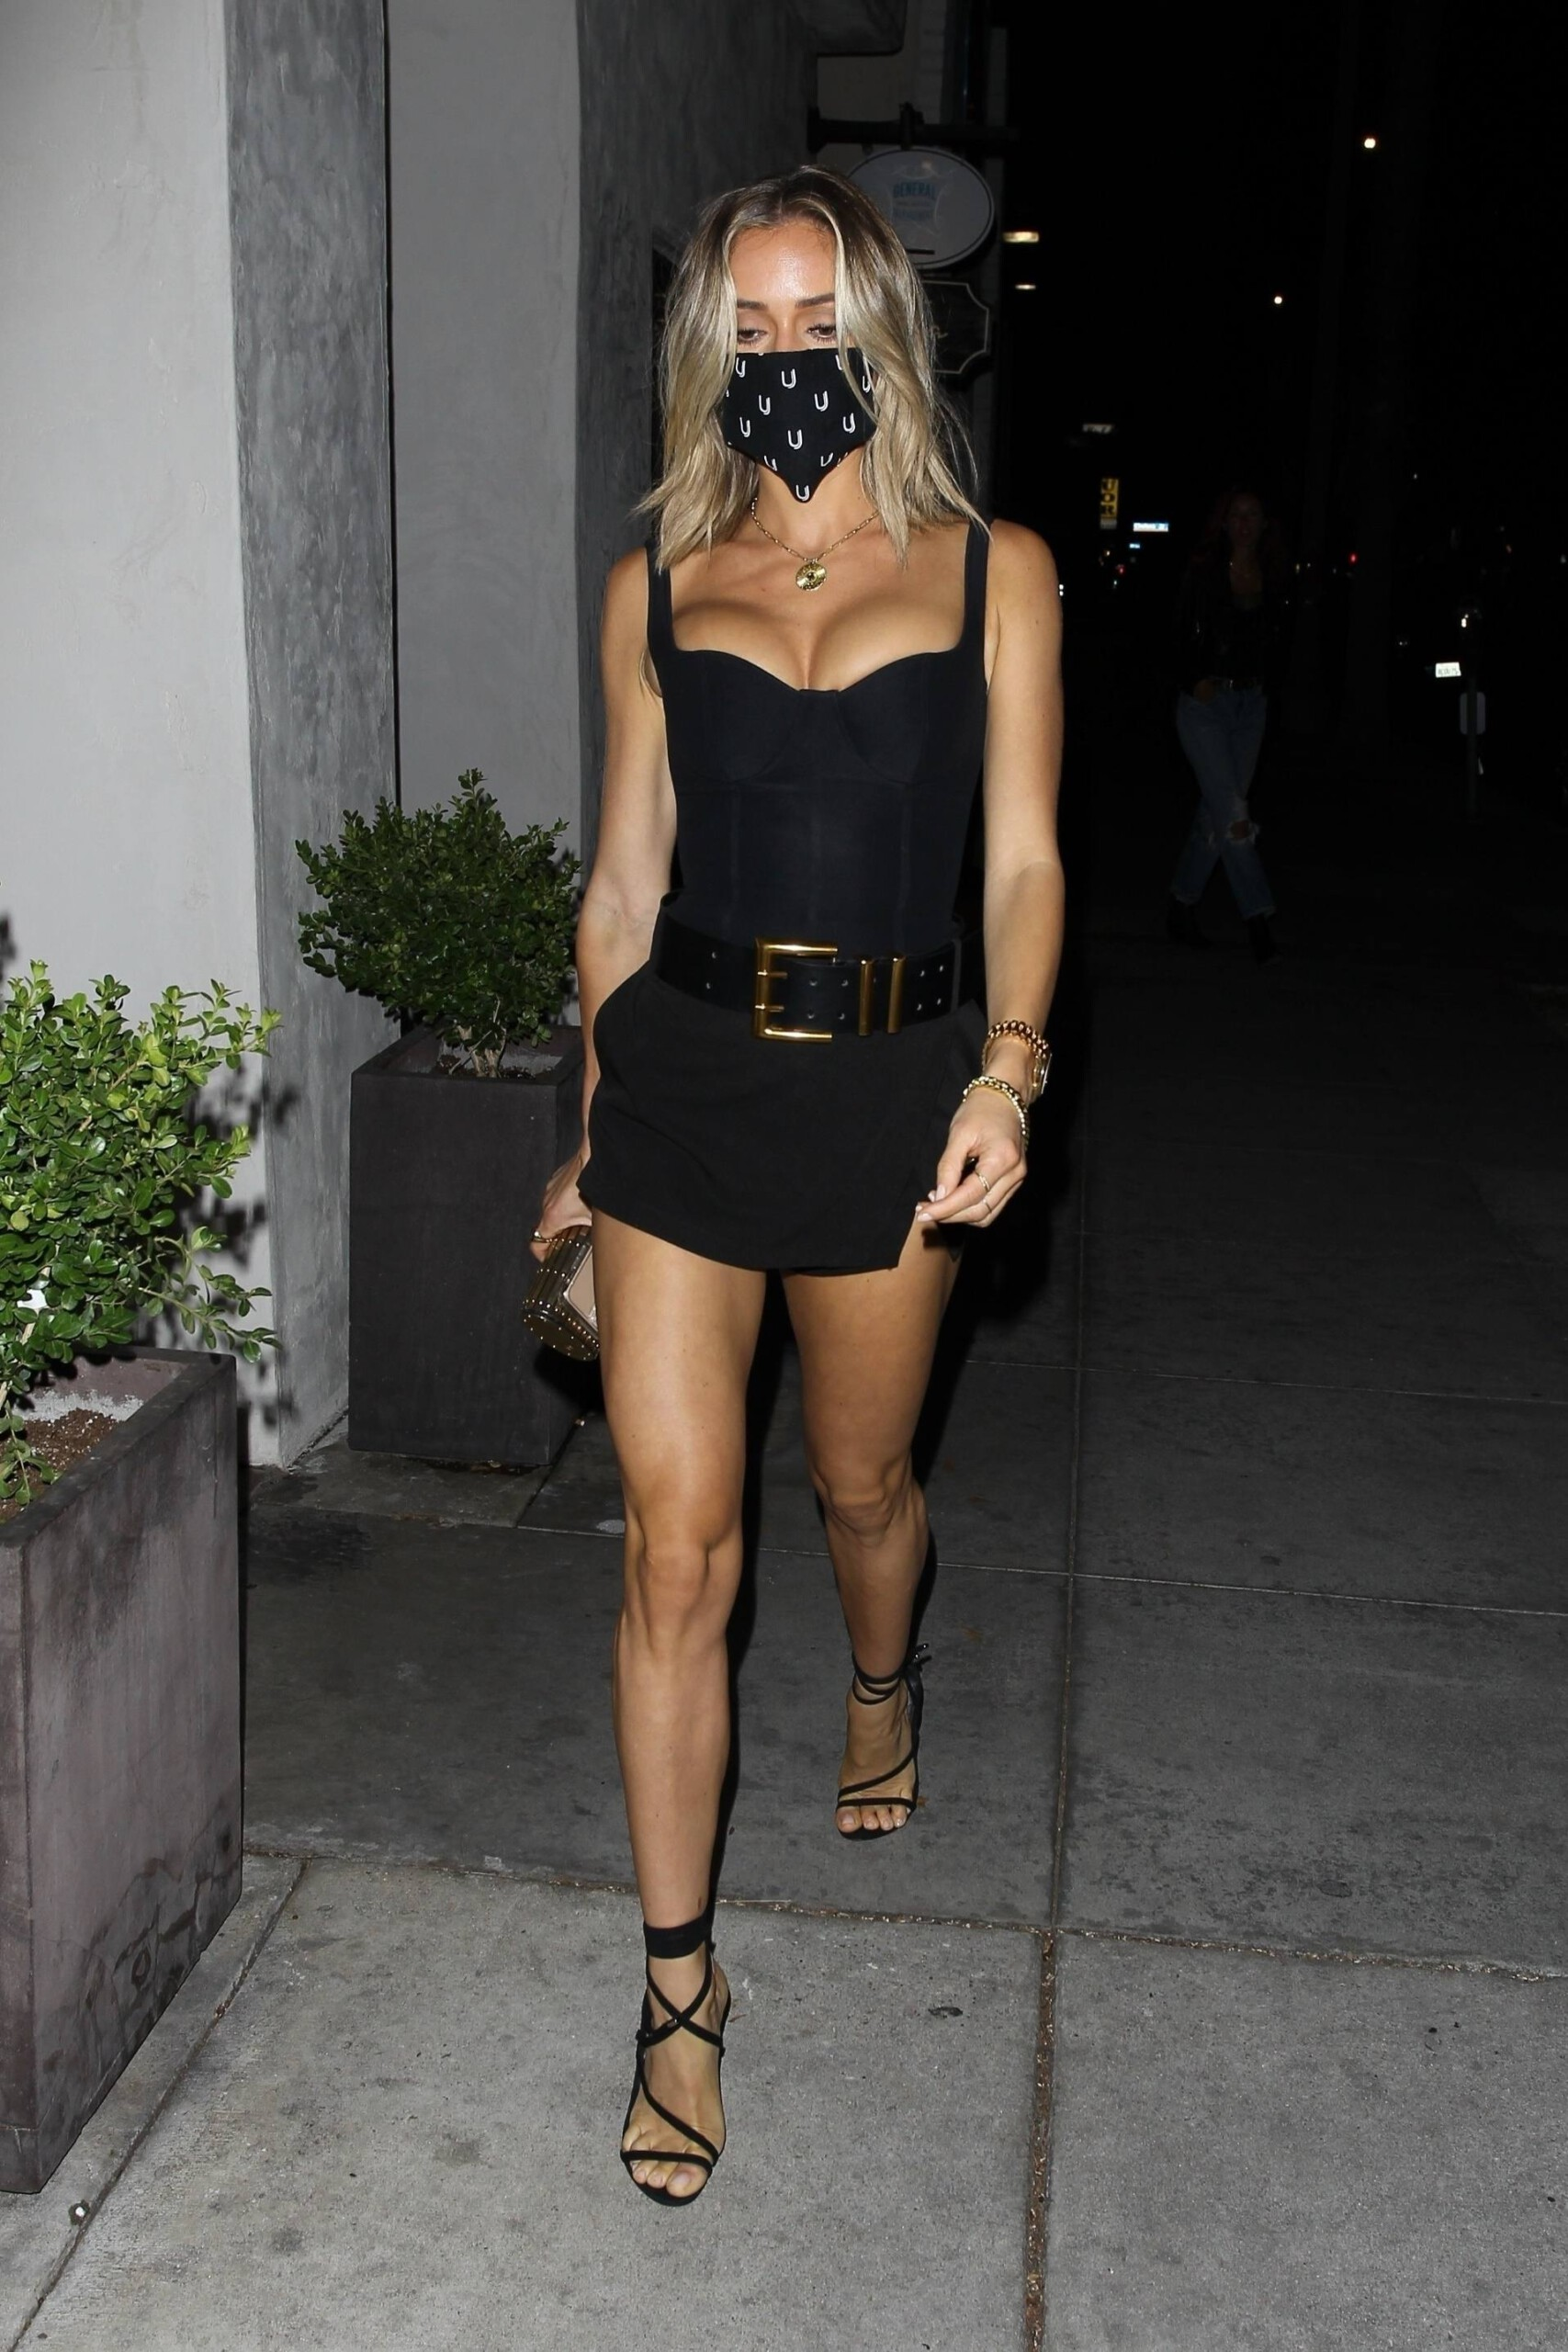 Kristin Cavallari – Sexy Legs And Beautiful Cleavage At Fia In Santa Monica 0019